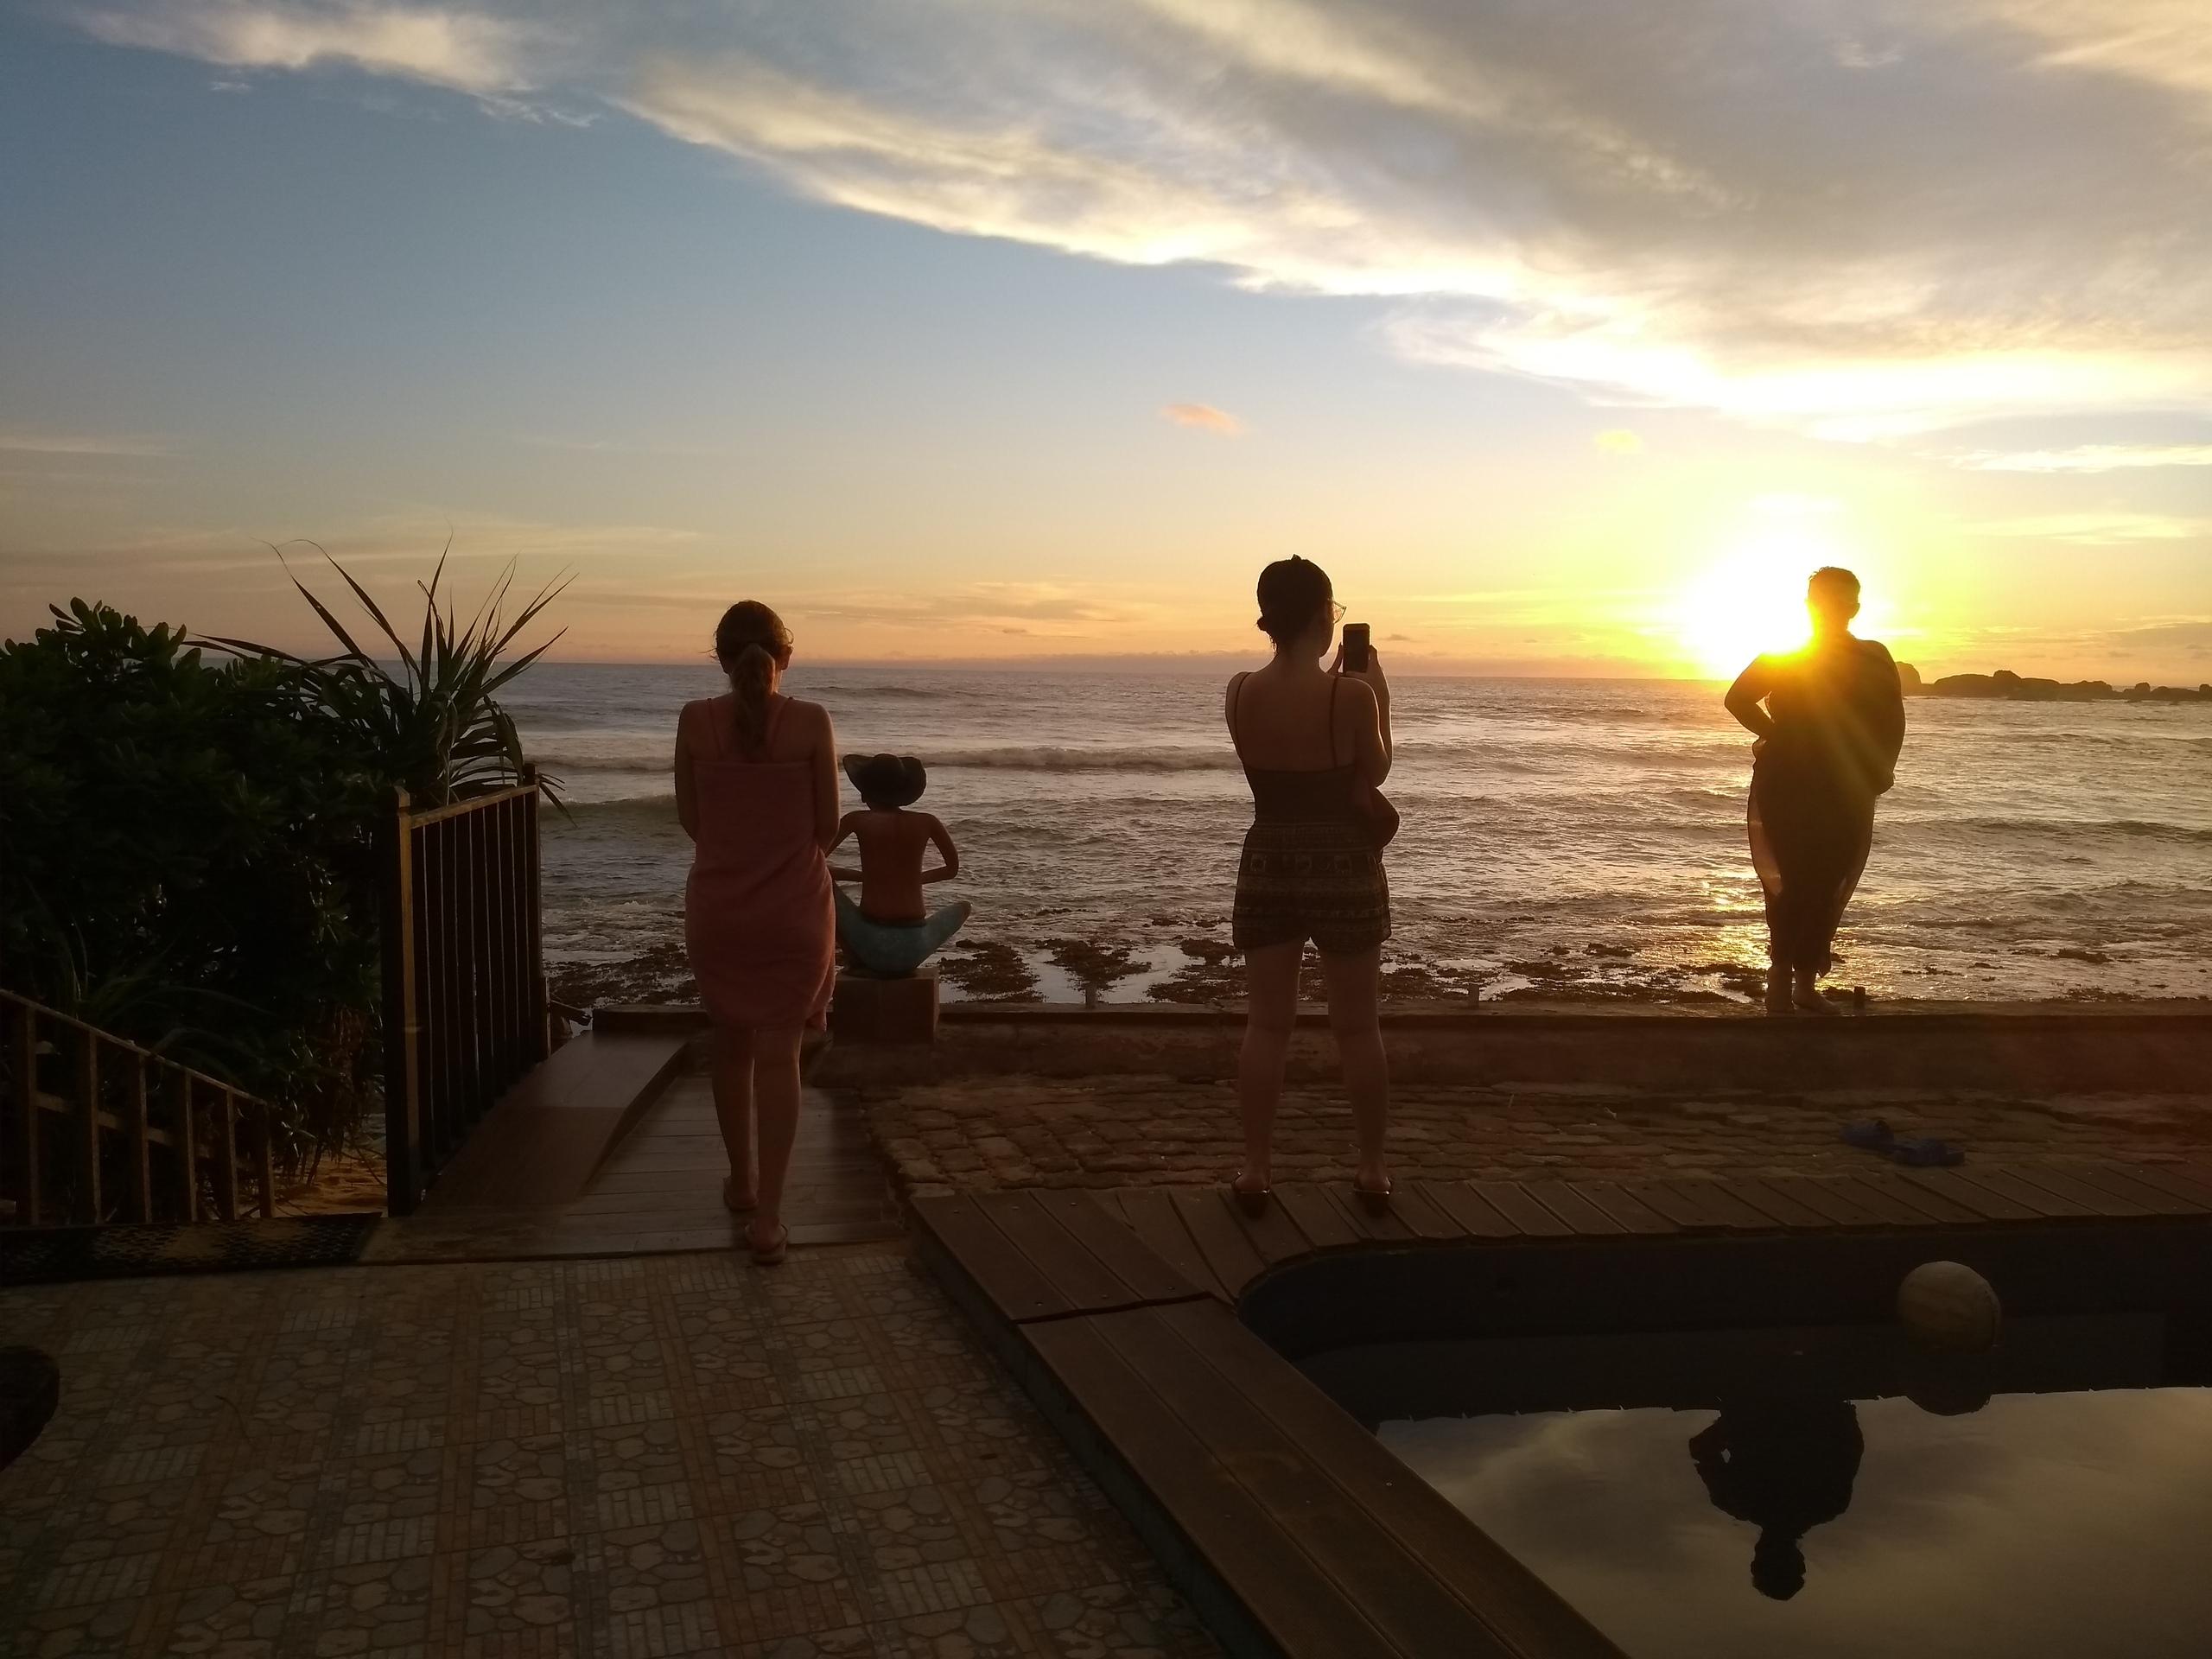 Шри Ланка (фото) - Страница 10 FVa_voN-u0o